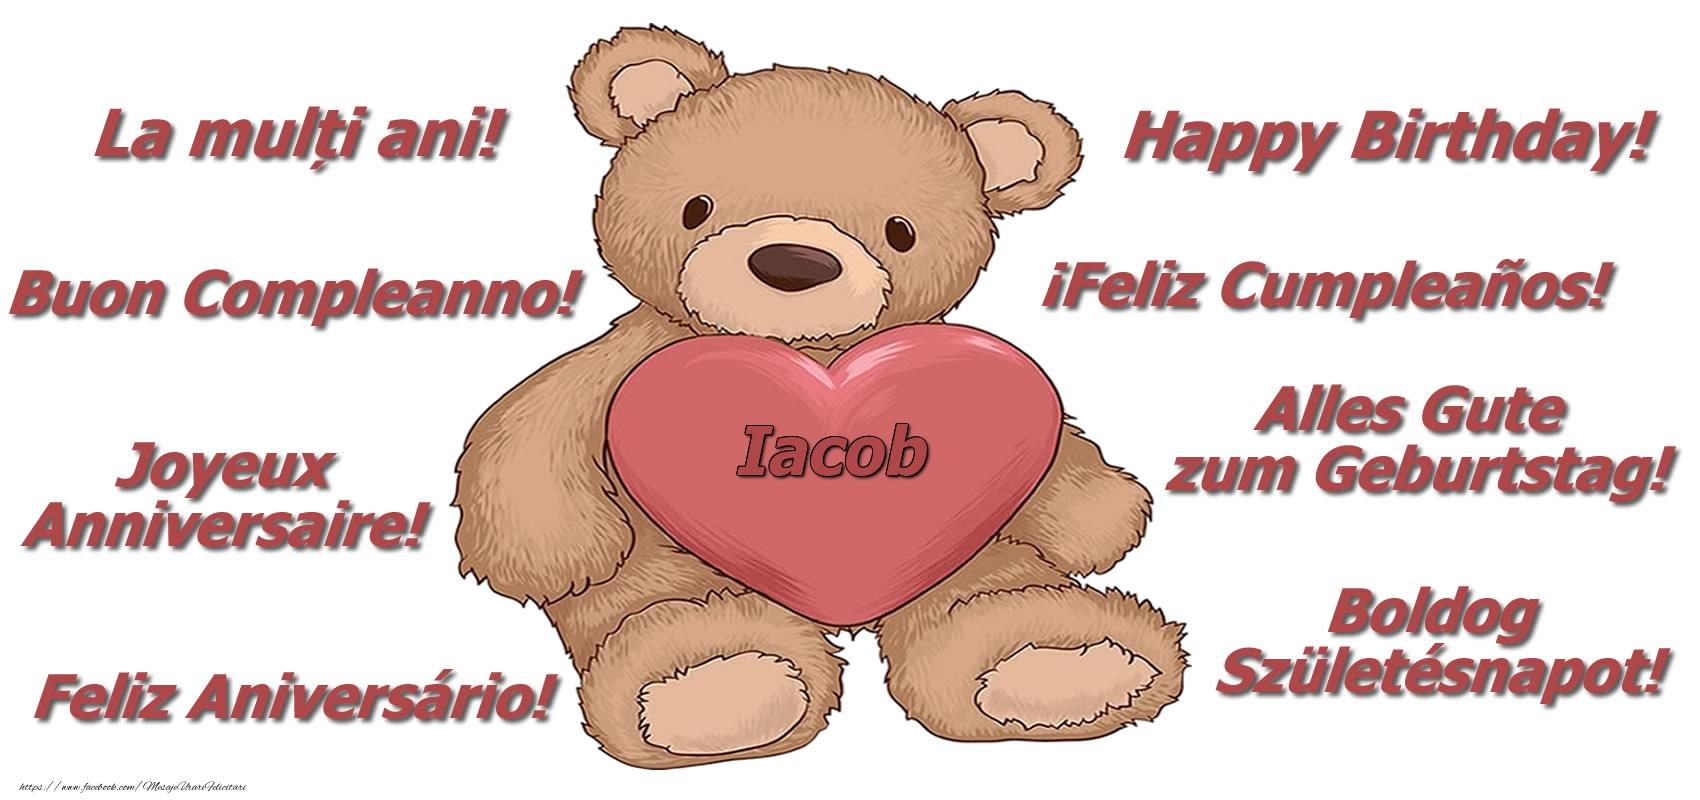 Felicitari de zi de nastere - La multi ani Iacob! - Ursulet